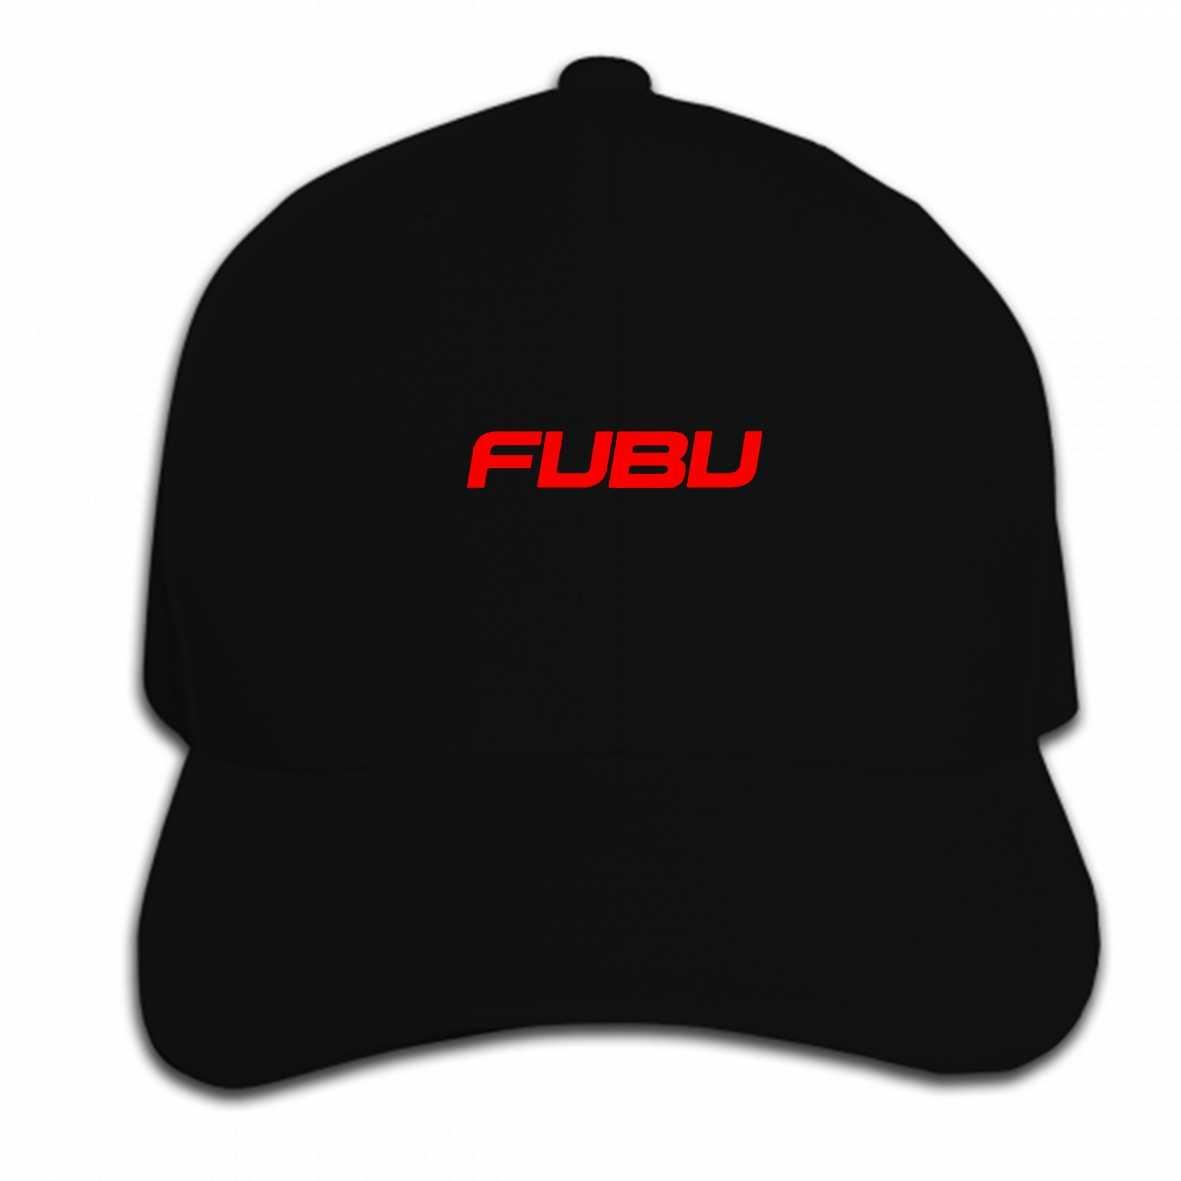 b2f675506827c Print Custom Baseball Cap Fubu Logo Graphic Men Casual s Black Hat Peaked  cap